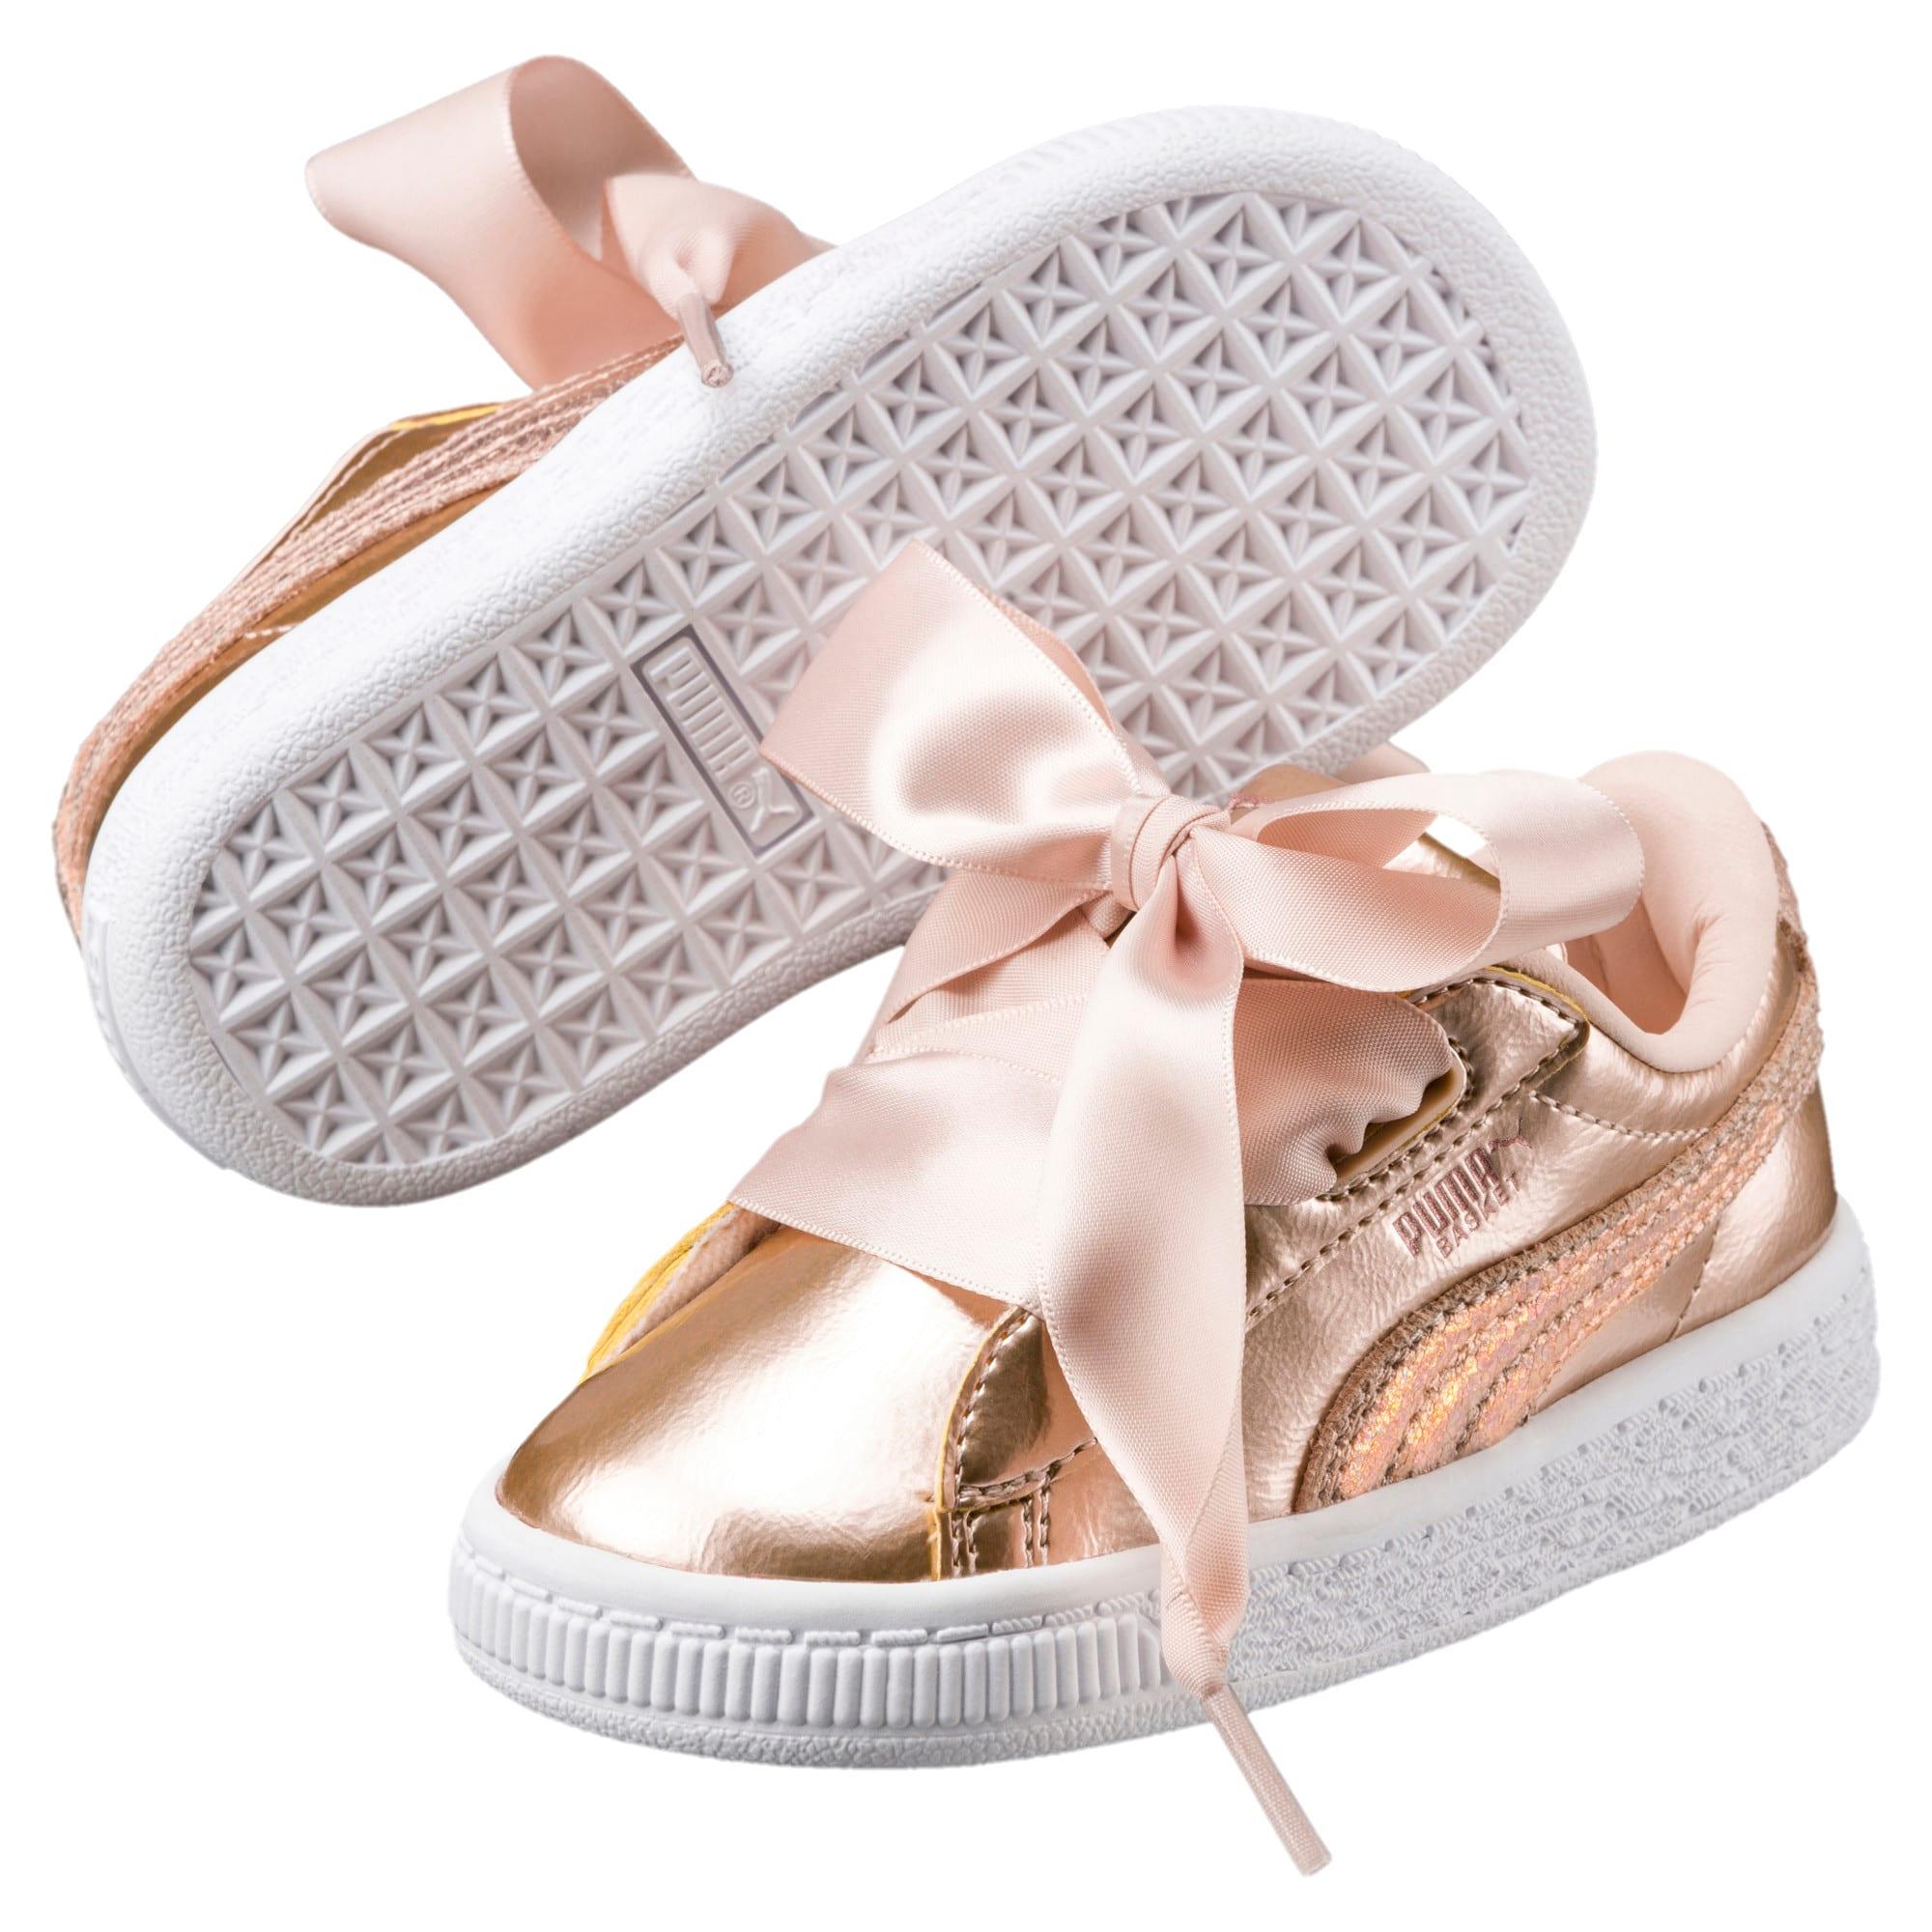 Thumbnail 2 of Basket Heart Lunar Lux Little Kids' Shoes, Cream Tan, medium